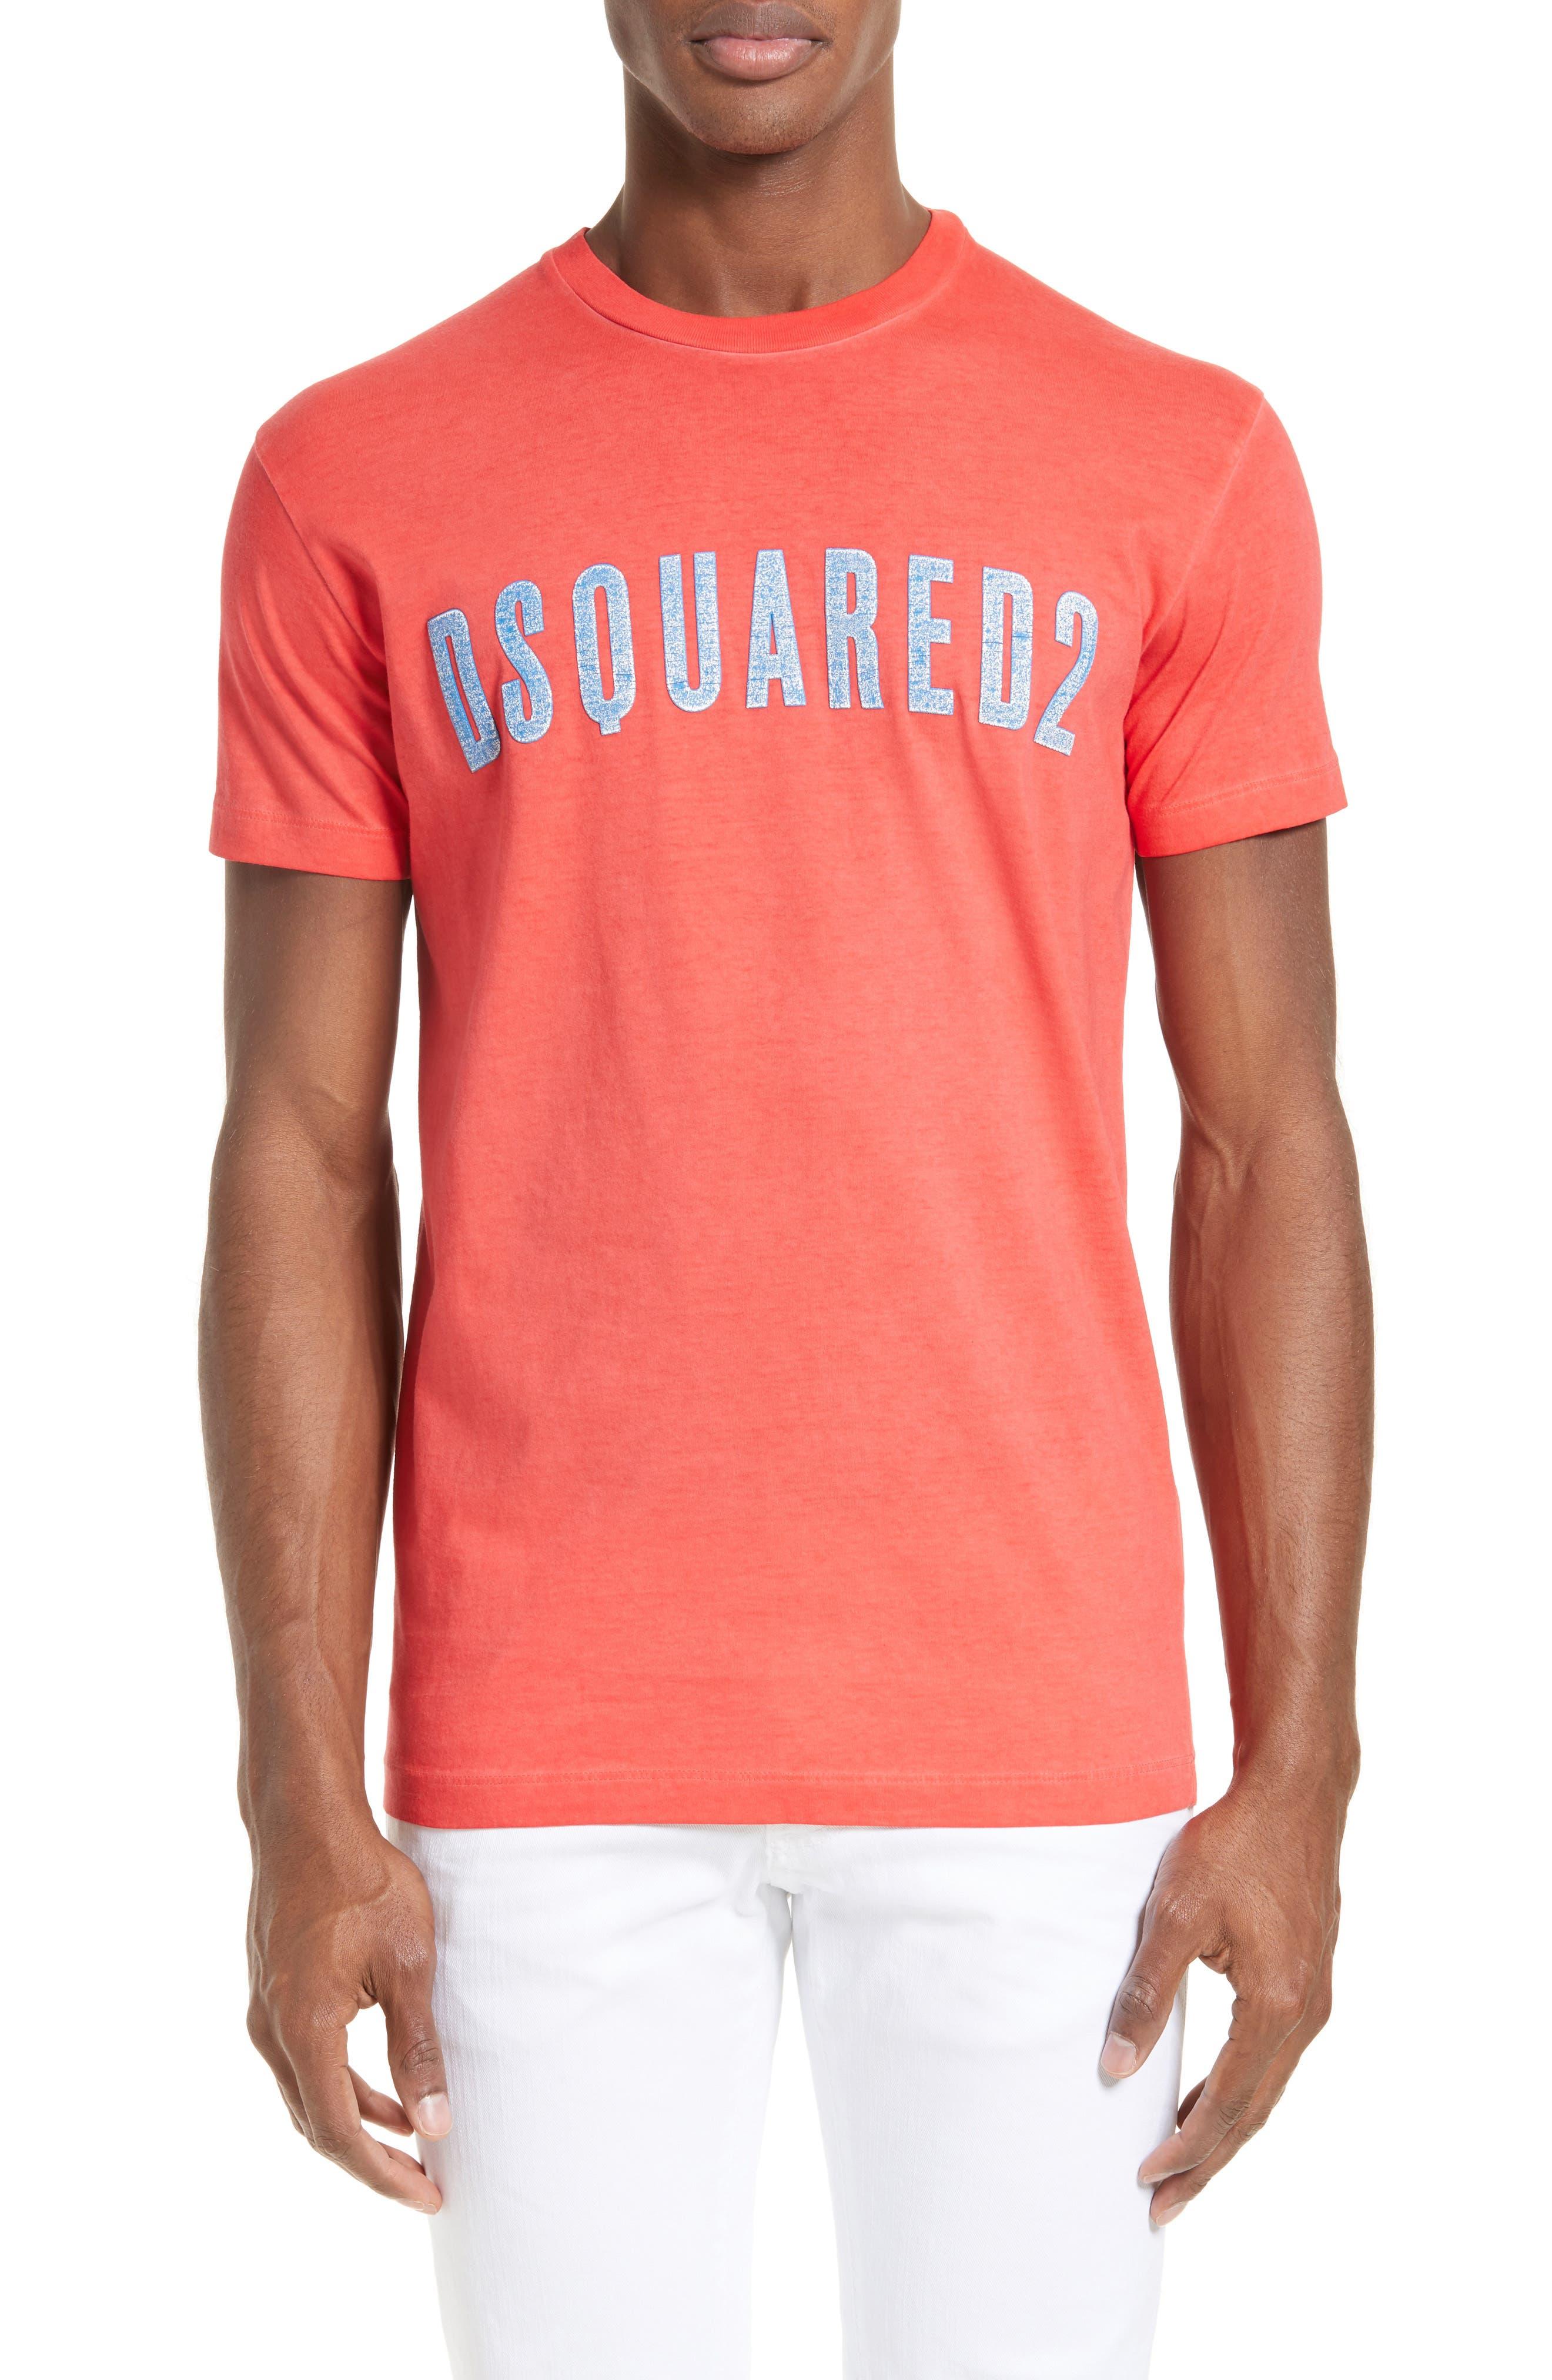 Alternate Image 1 Selected - Dsquared2 Crackle Logo T-Shirt